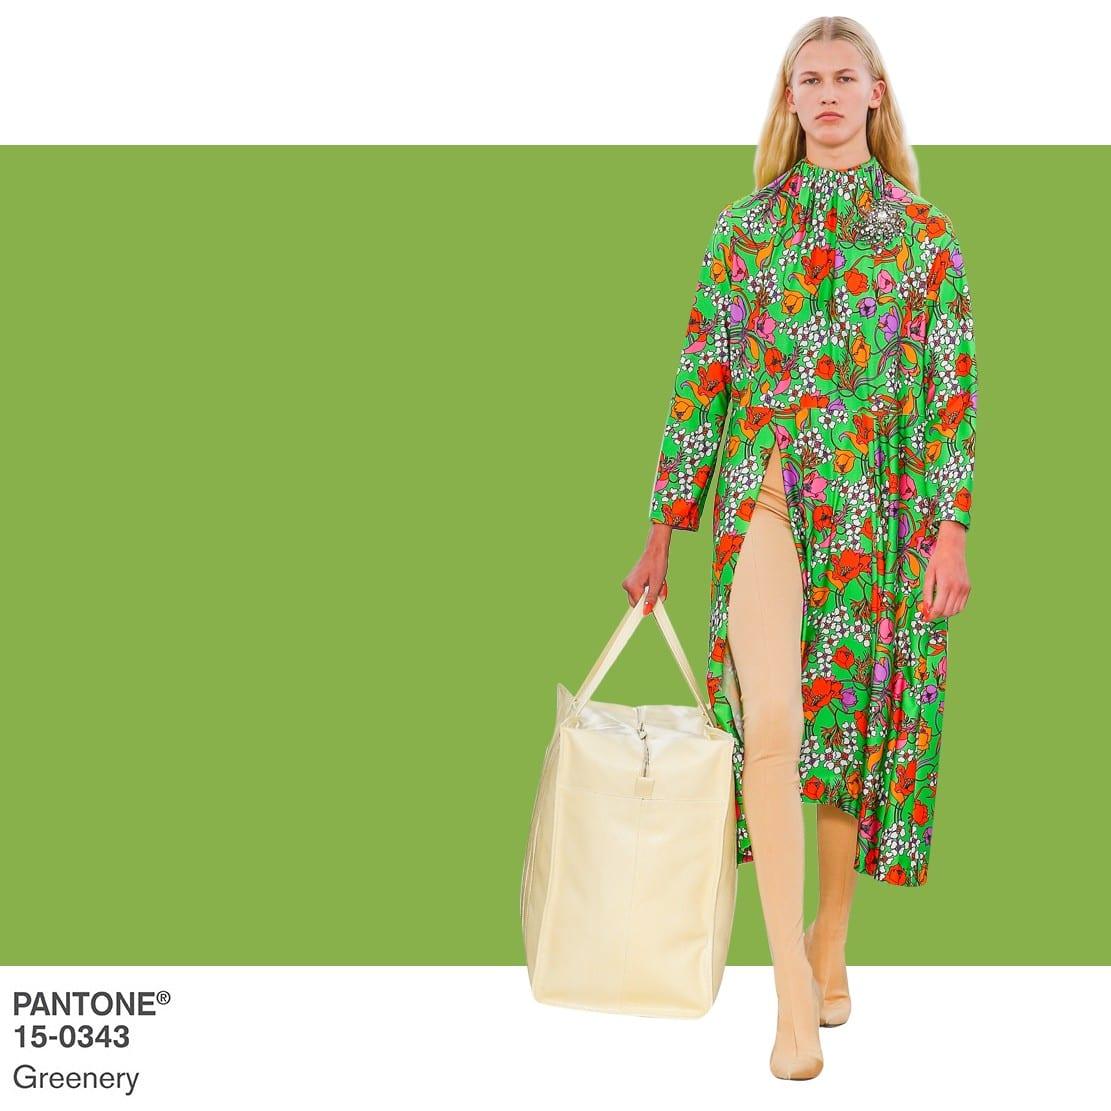 pantone-greenery-3